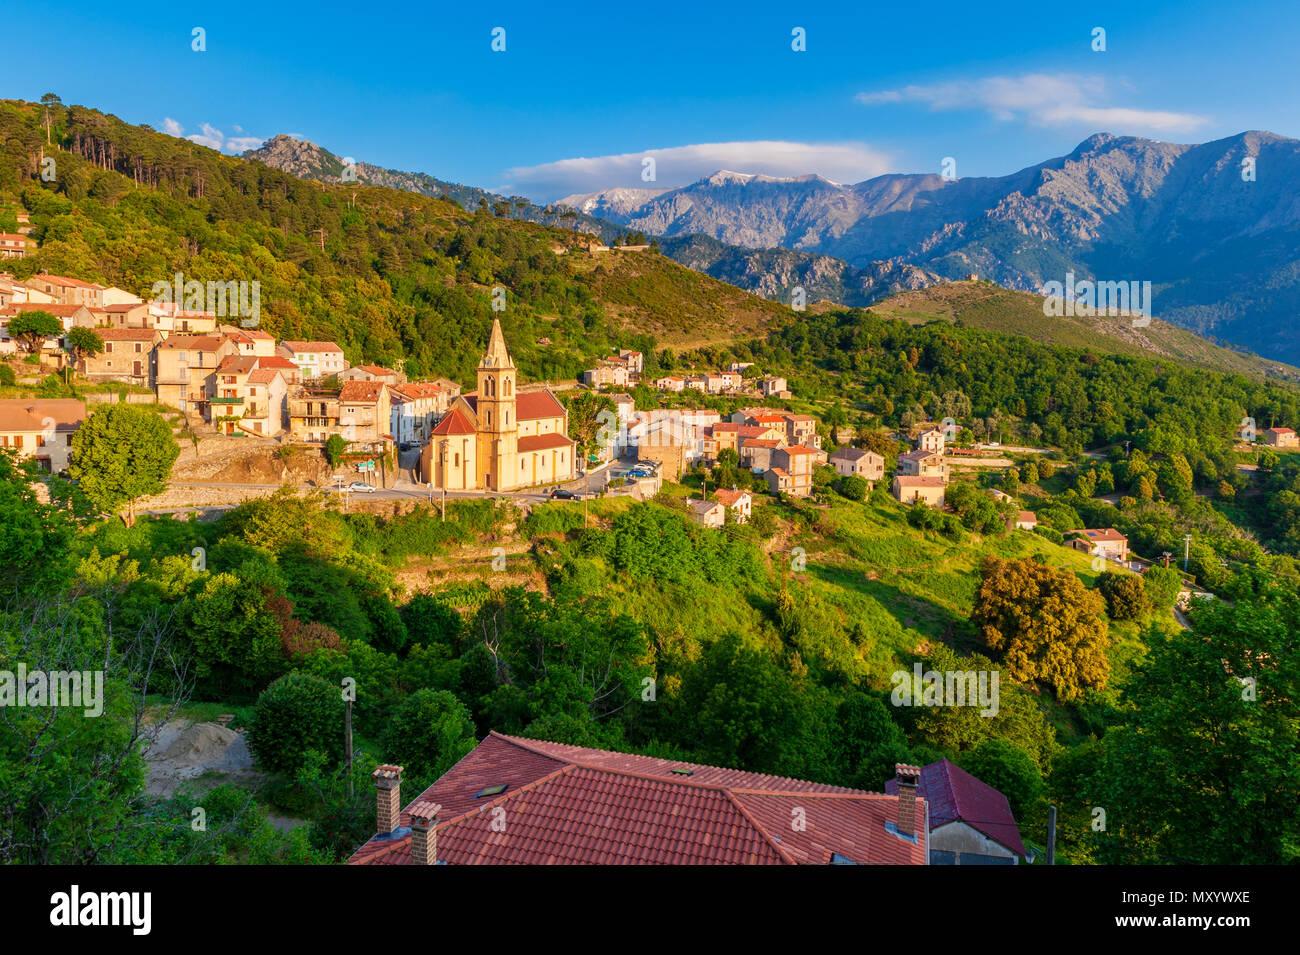 Village de Venaco, Corse, France Photo Stock